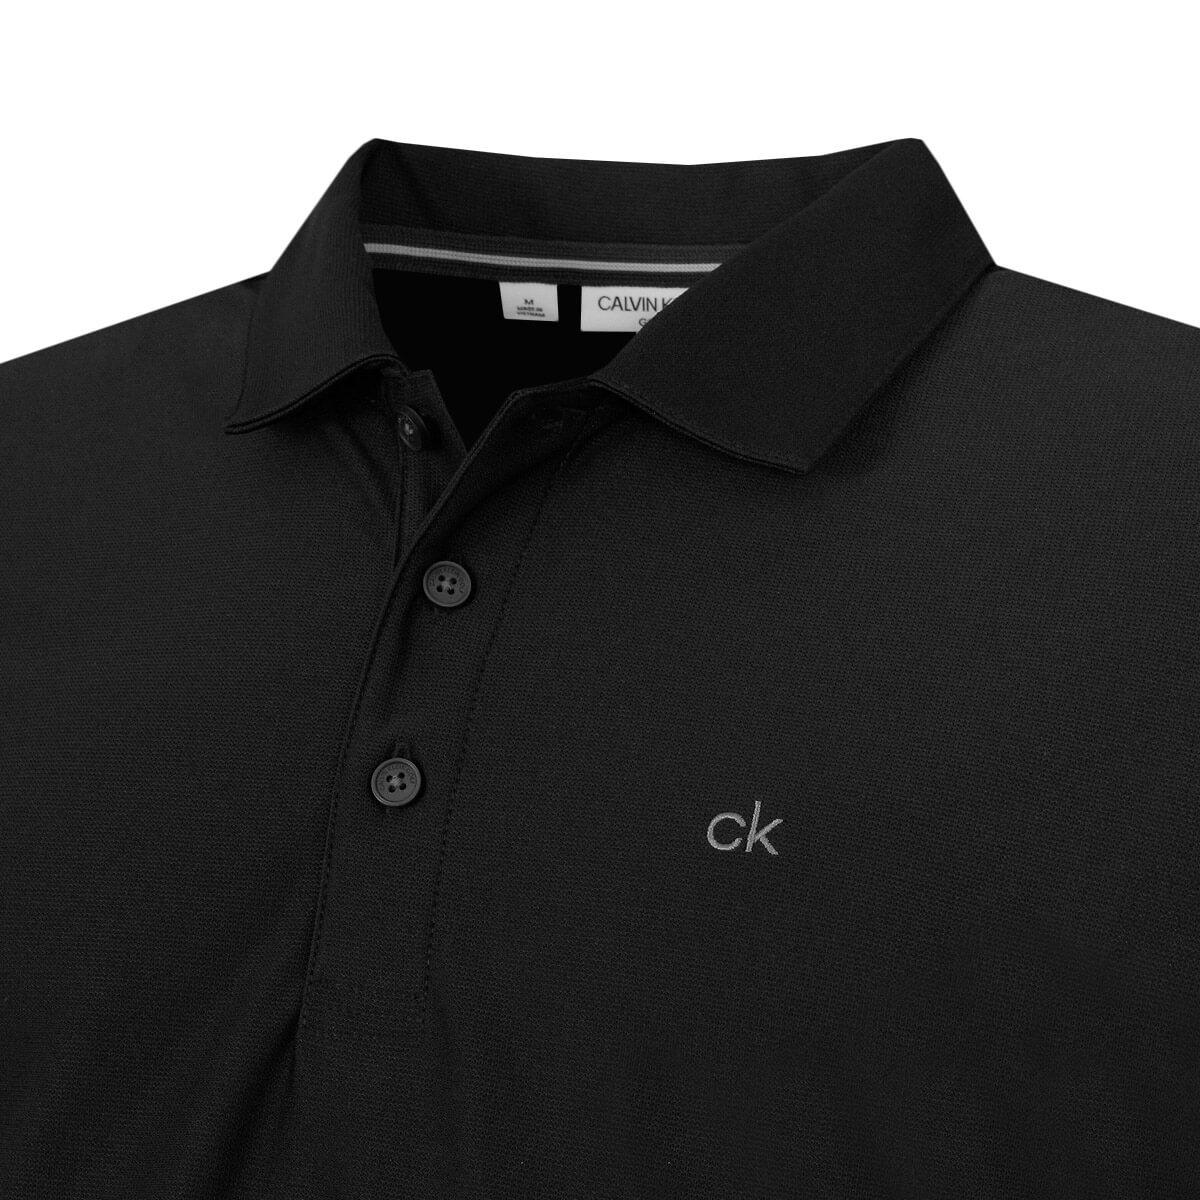 Calvin-Klein-Homme-2020-a-manches-longues-Light-Central-Golf-Polo-Shirt-45-off-RRP miniature 4